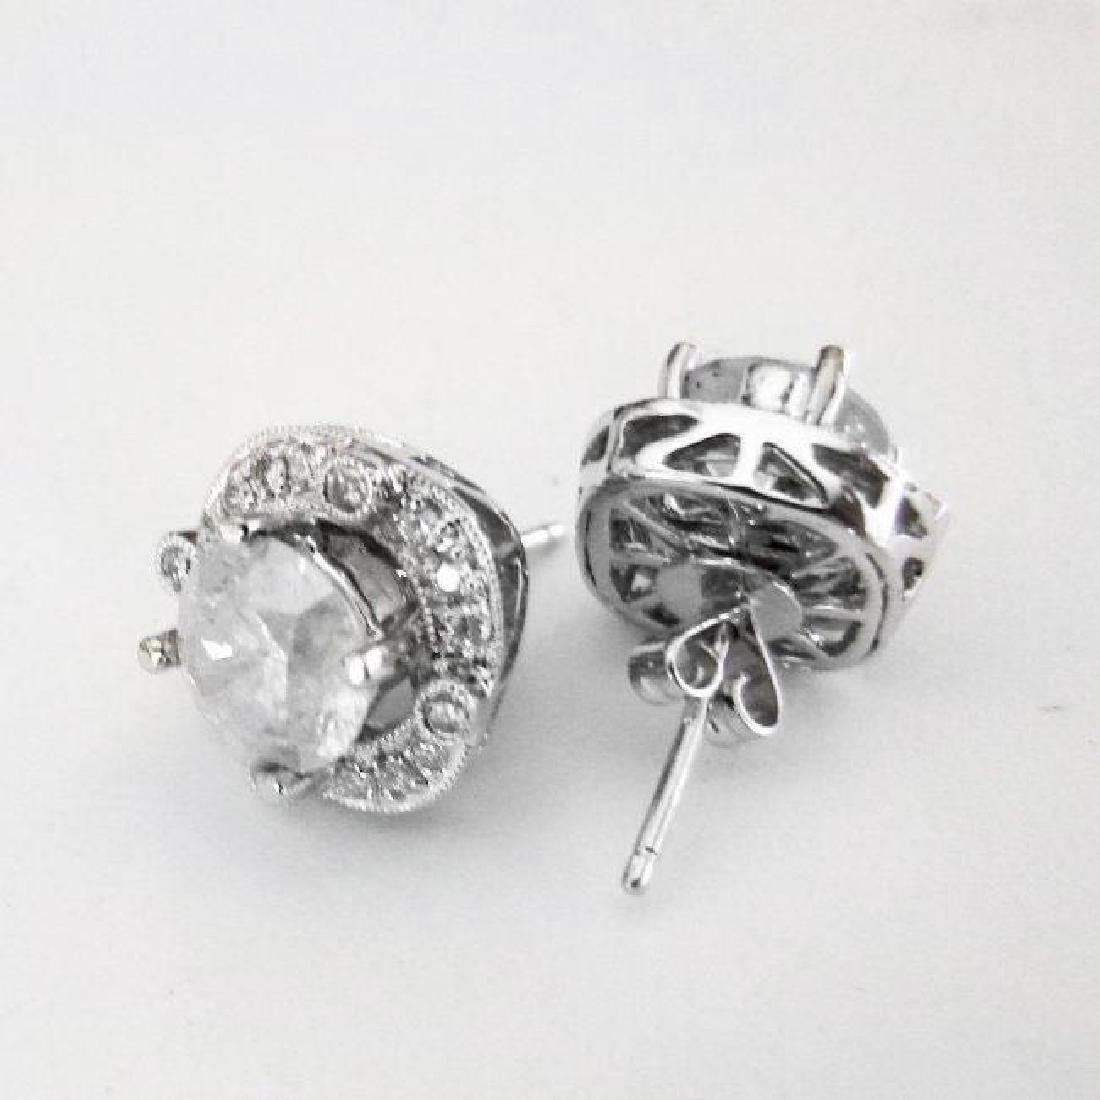 Jacket Stud Earrings Diamond 3.03Ct 18K White Gold - 5